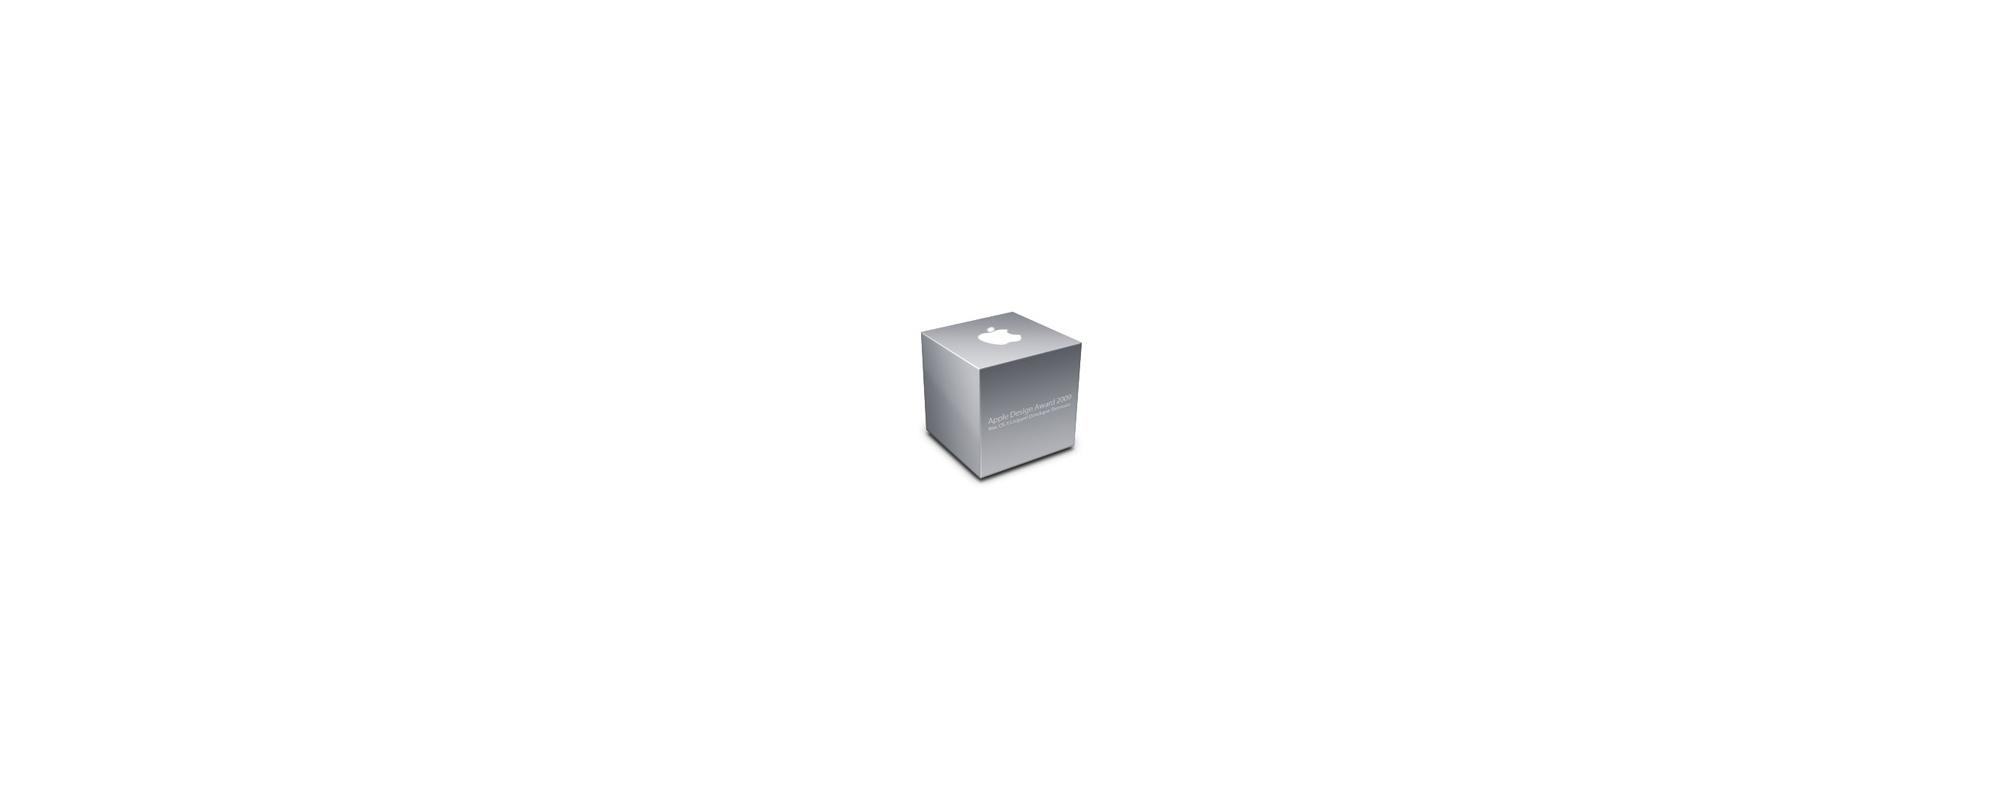 Apple-Design-Awards